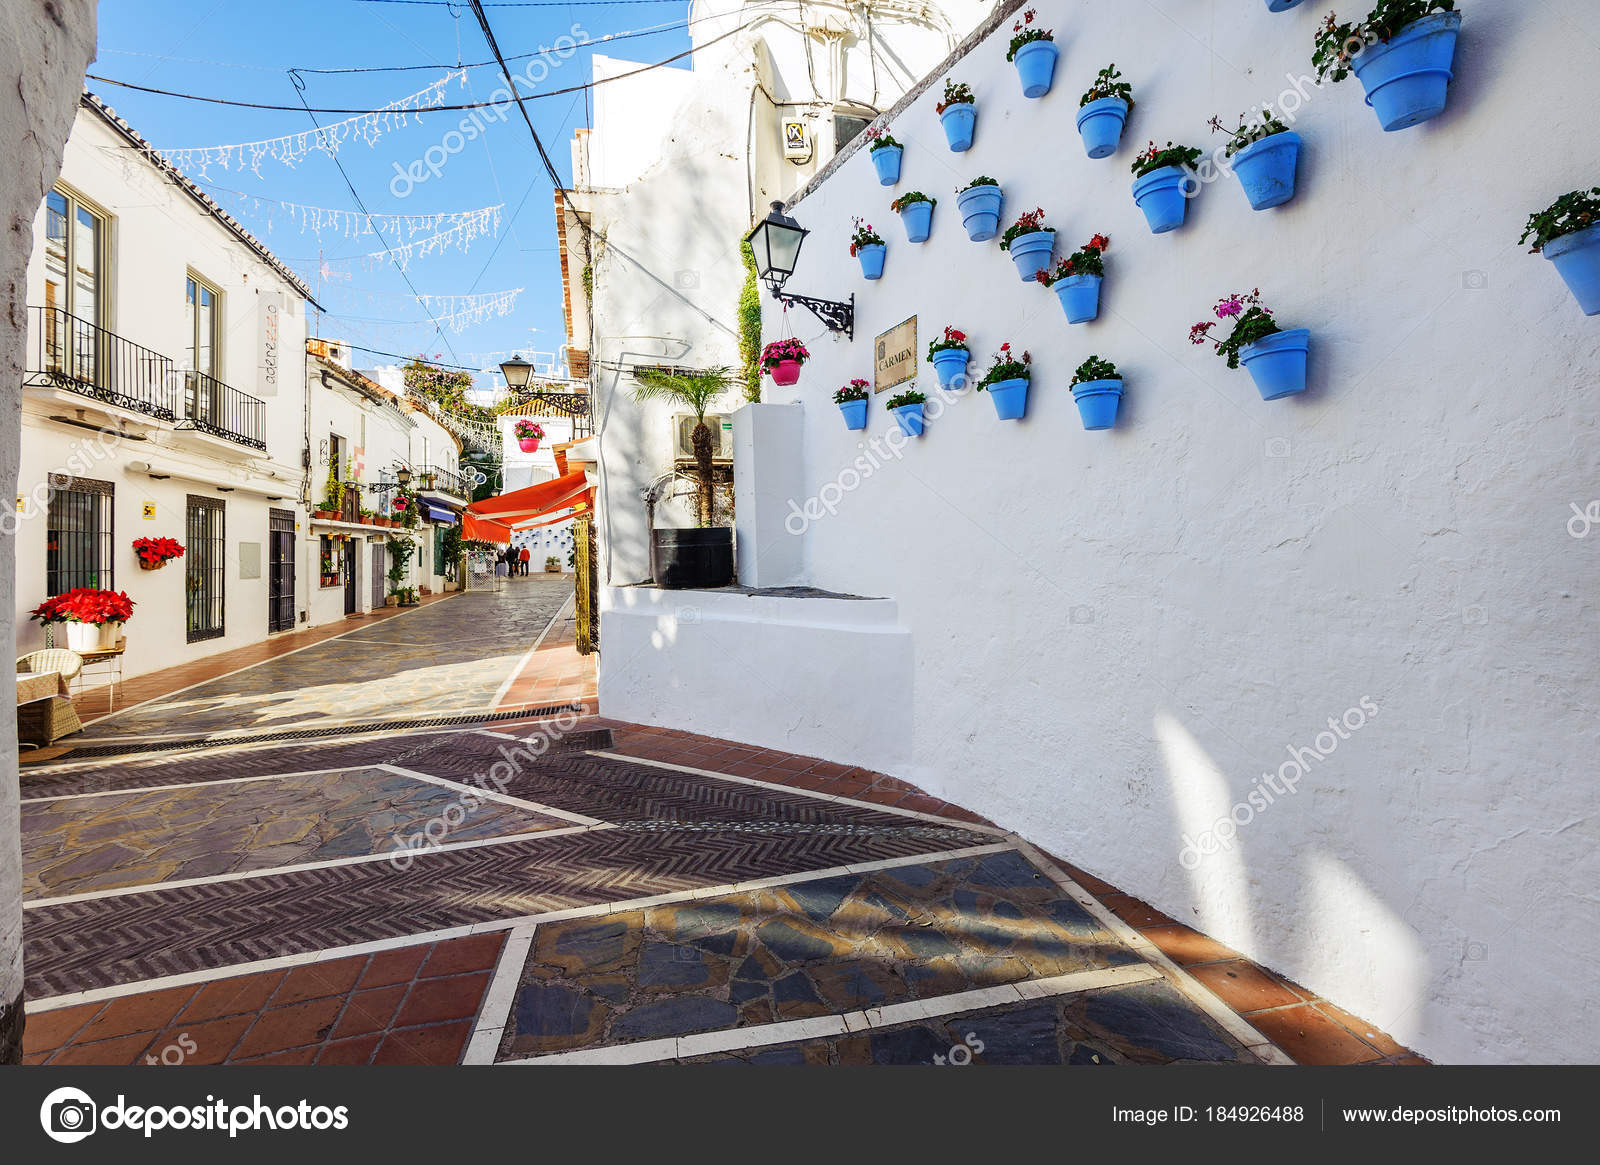 Depositphotos & Marbella Spain December 2017 Spanish Street Blue Flower Pots ...